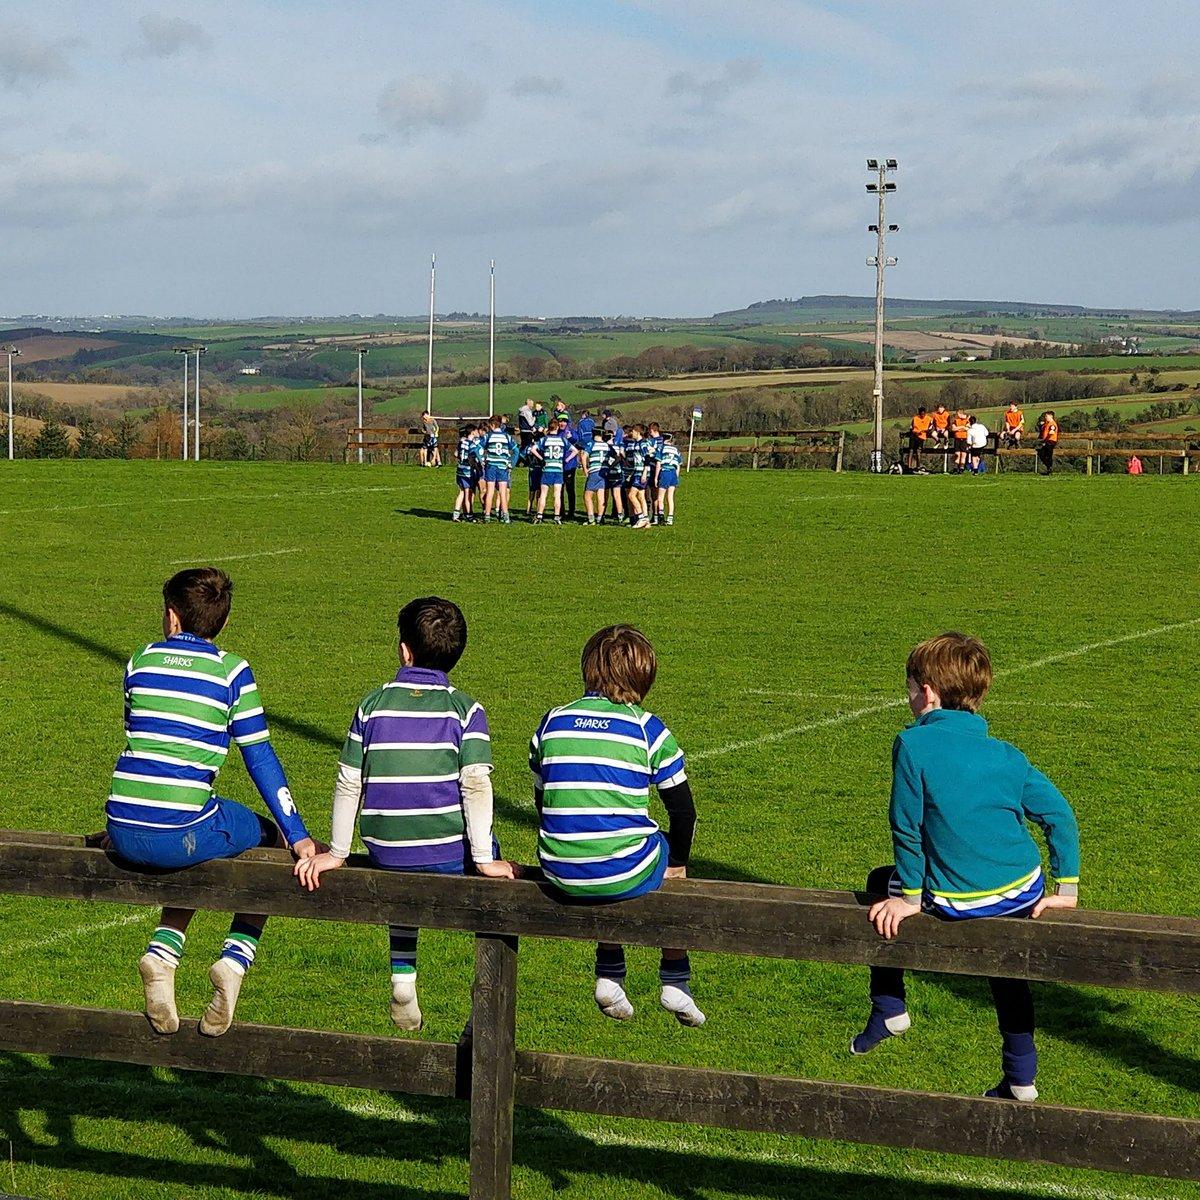 How it all begins.. u10s watching u14s at @KinsaleRFC1 #JuniorRugby #ComeOnSharks<br>http://pic.twitter.com/508ydCSqNl